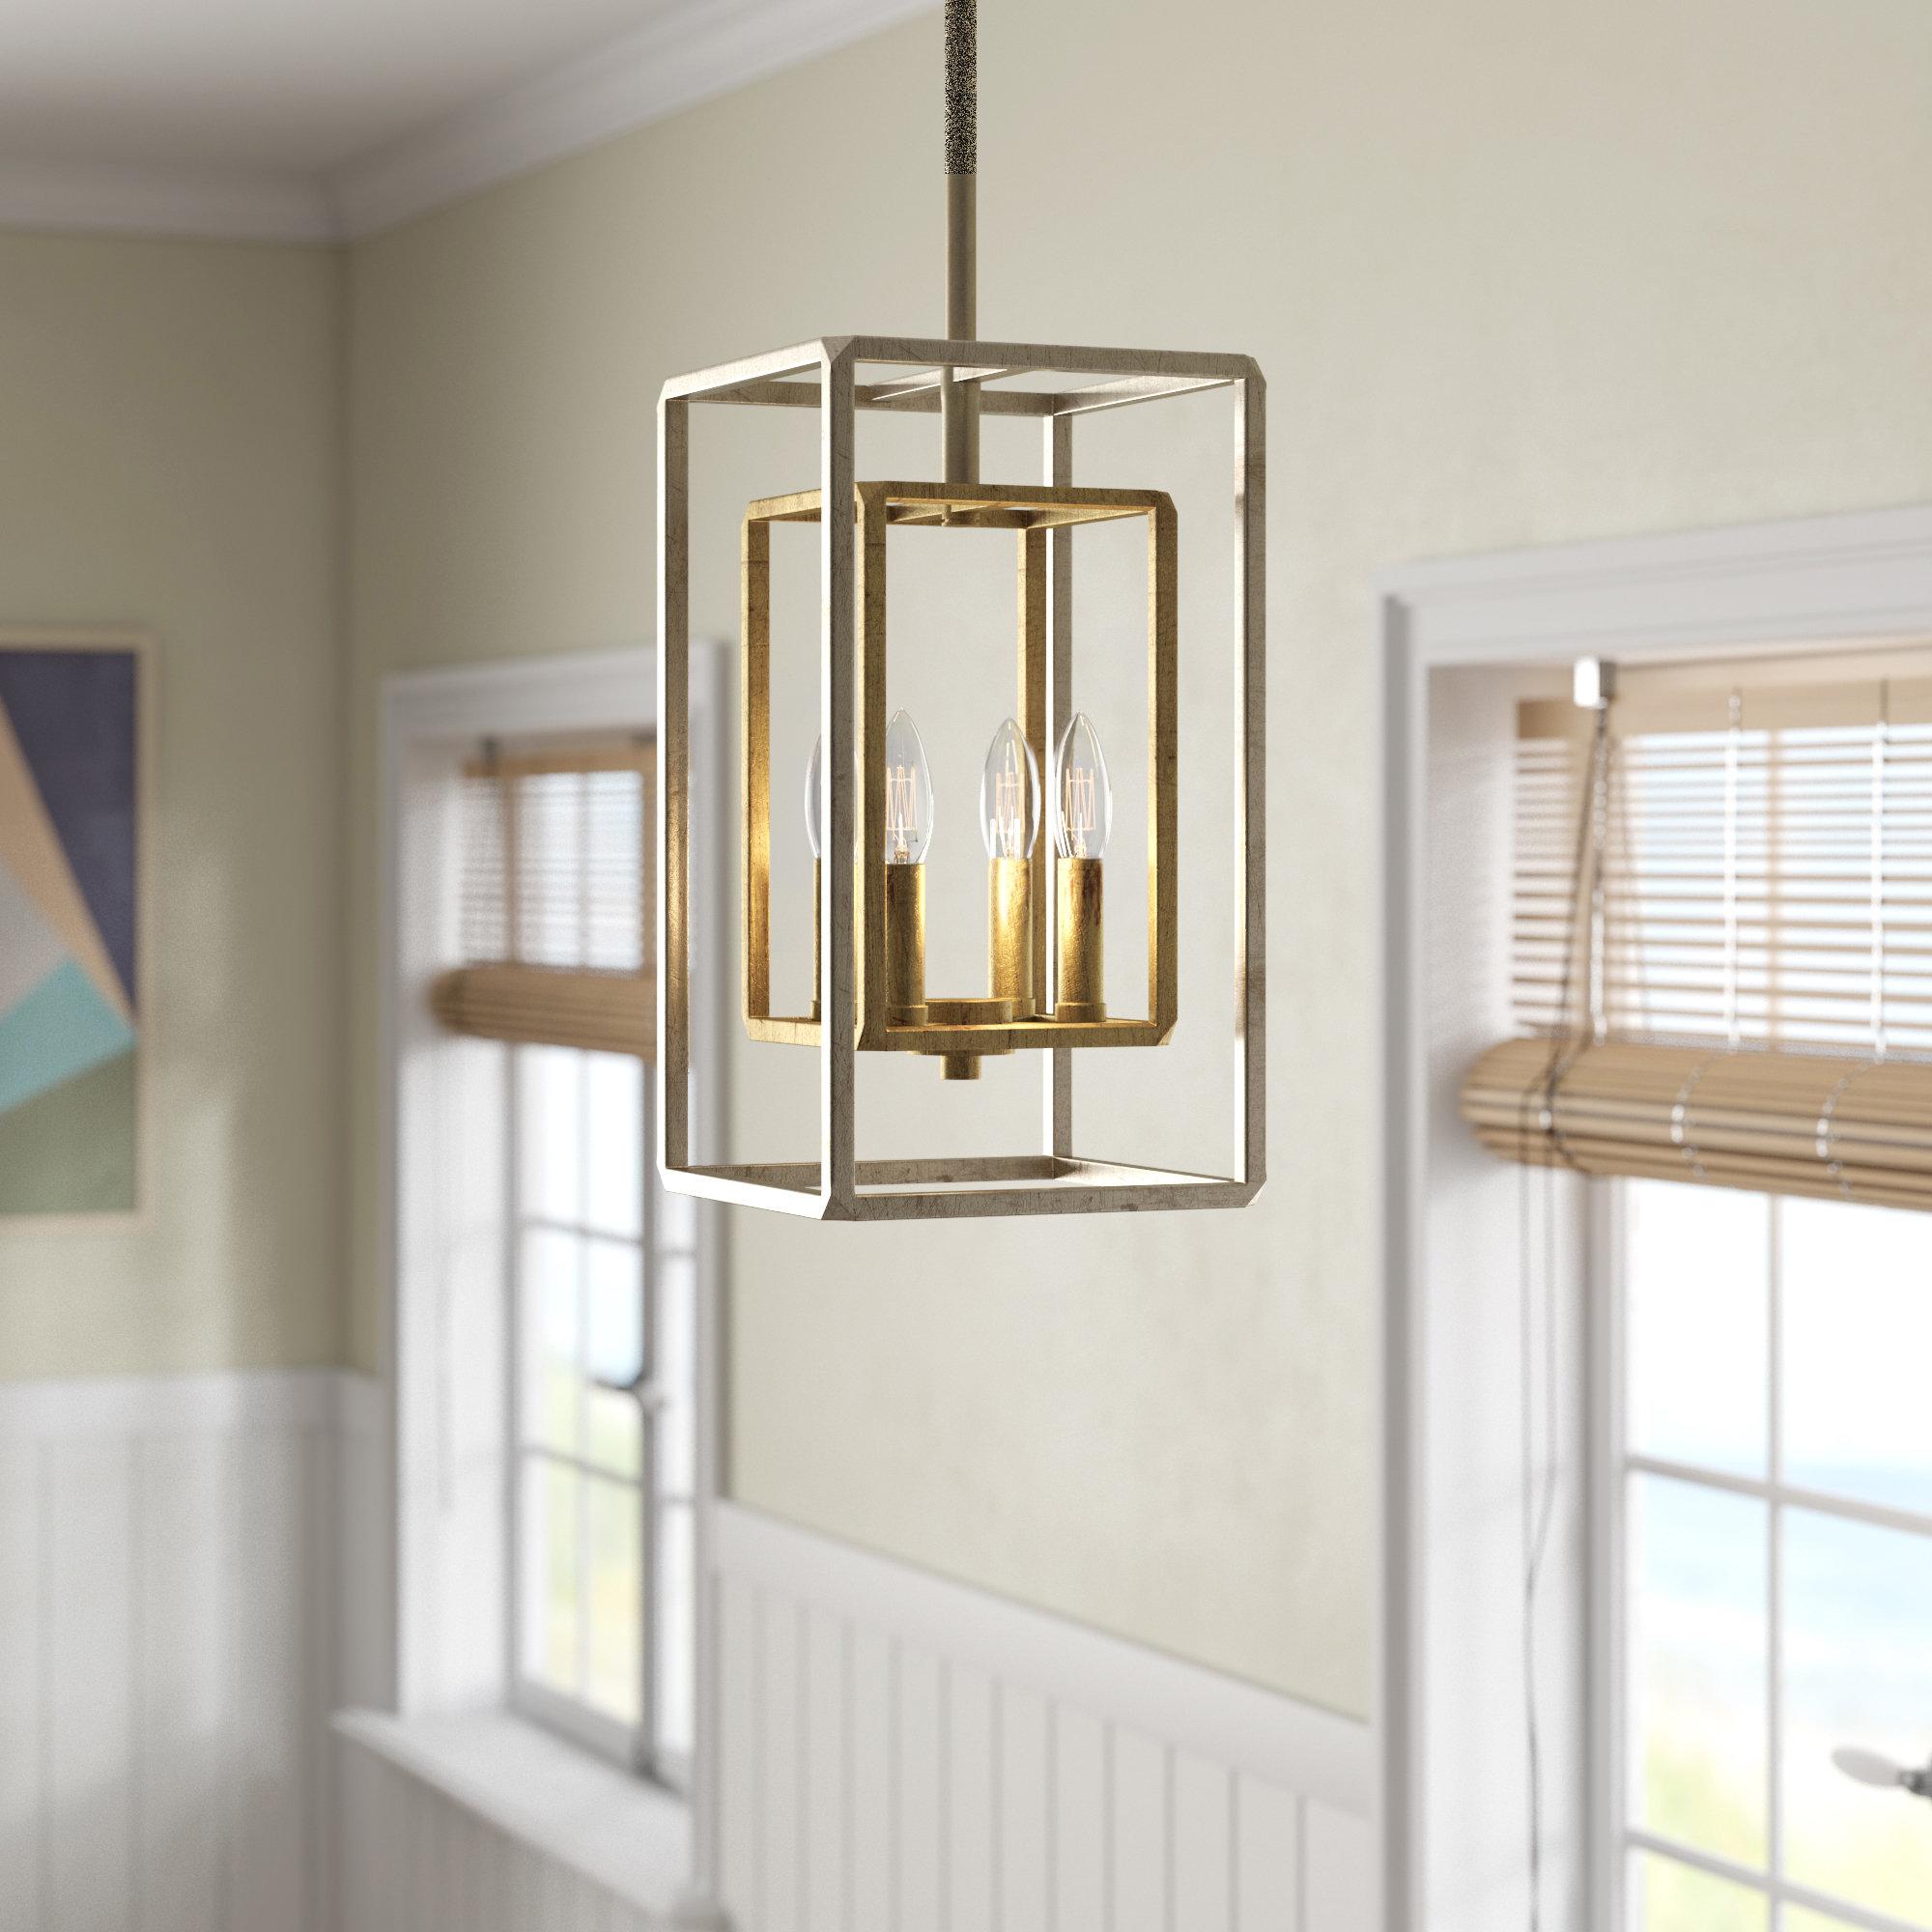 Aldo 4 Light Lantern Rectangle Pendant Reviews Joss Main